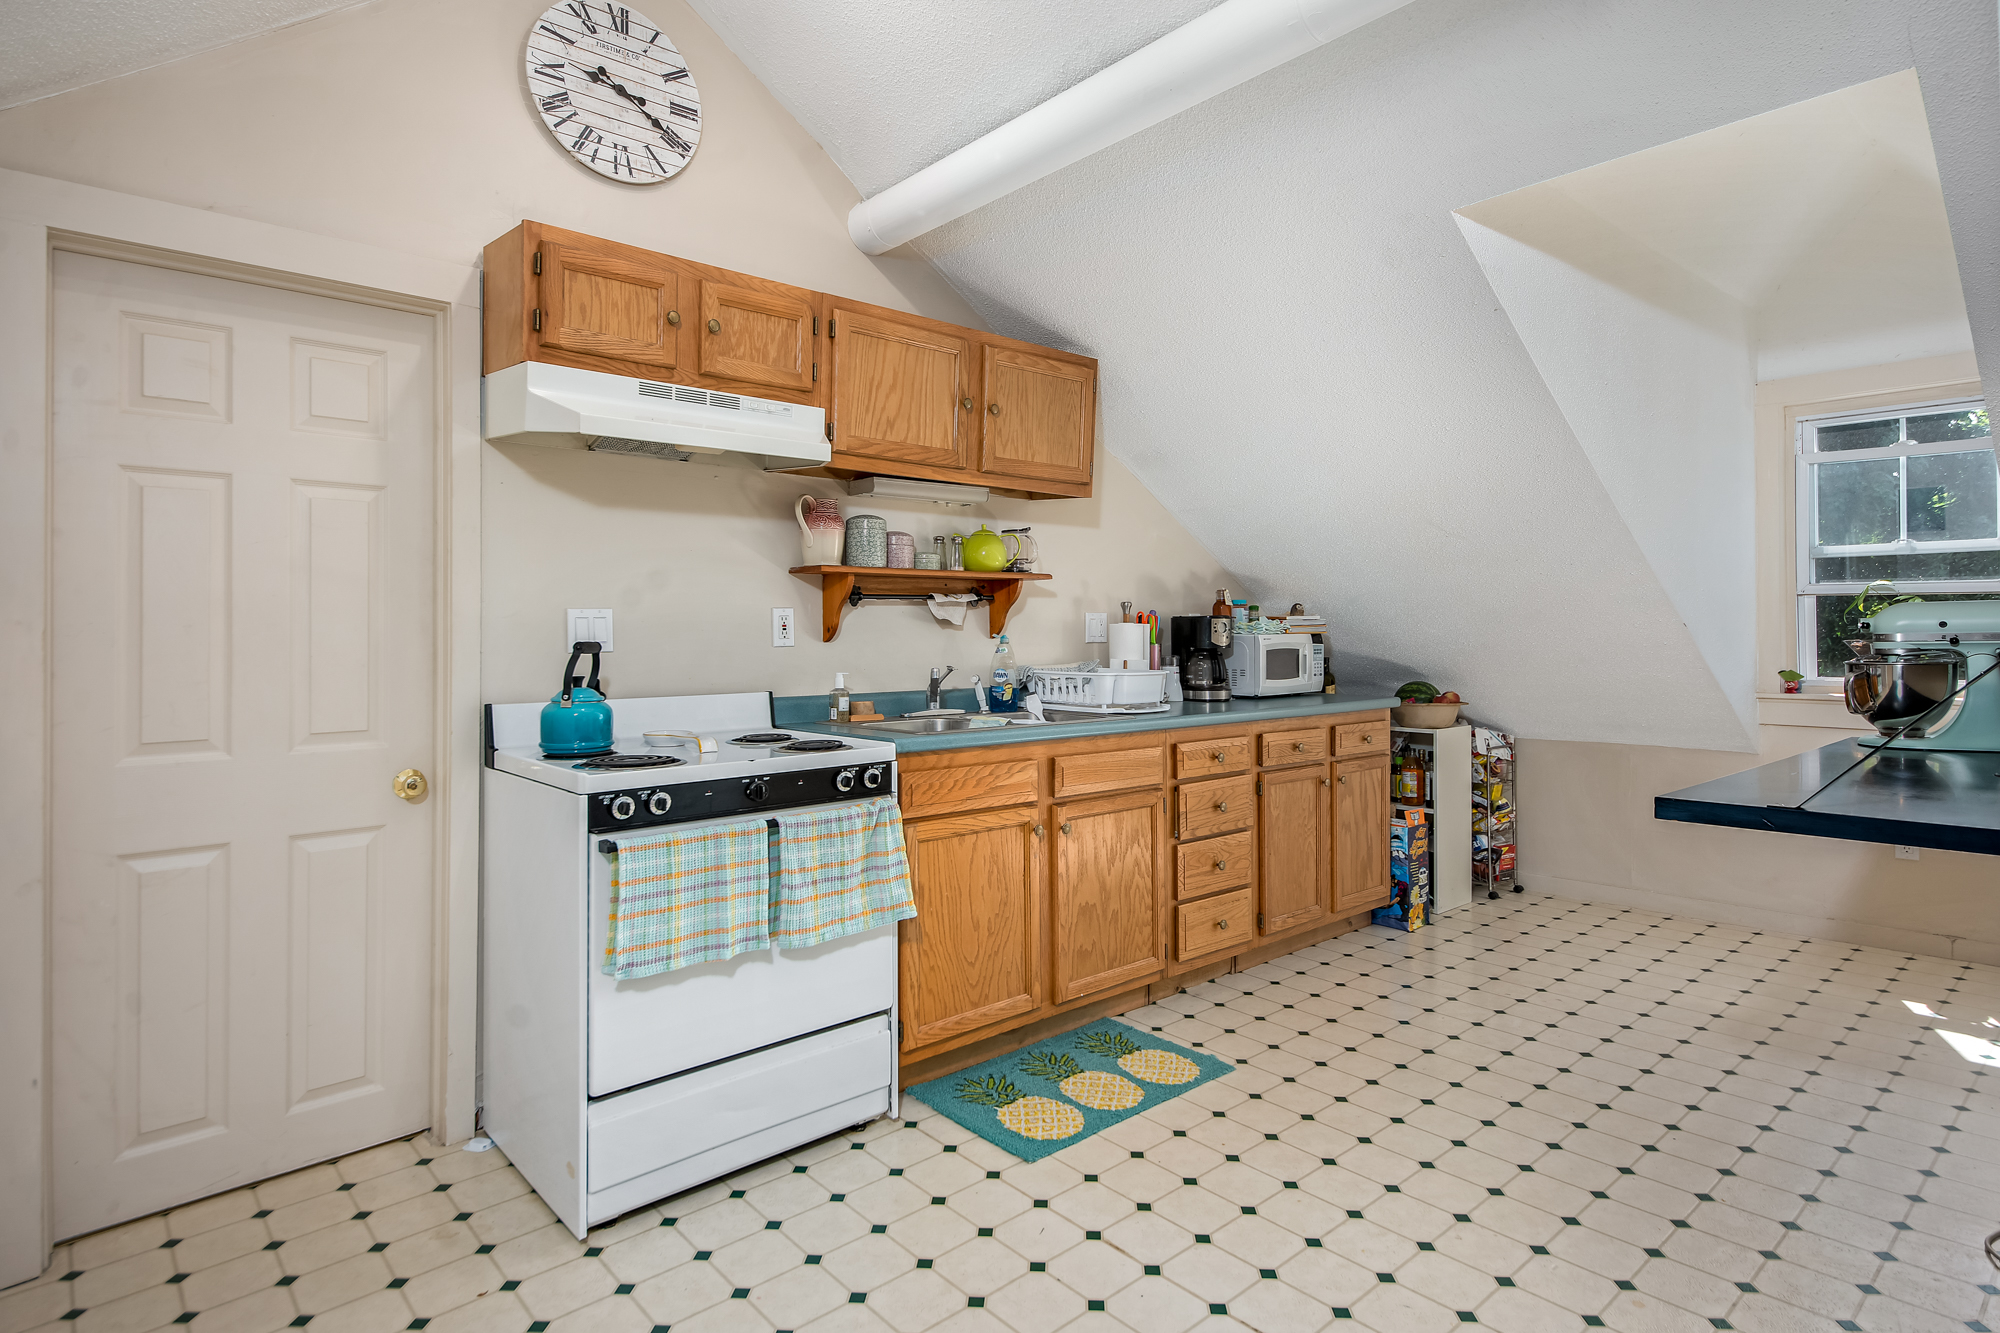 51-53 Prospect-kitchen23.jpg